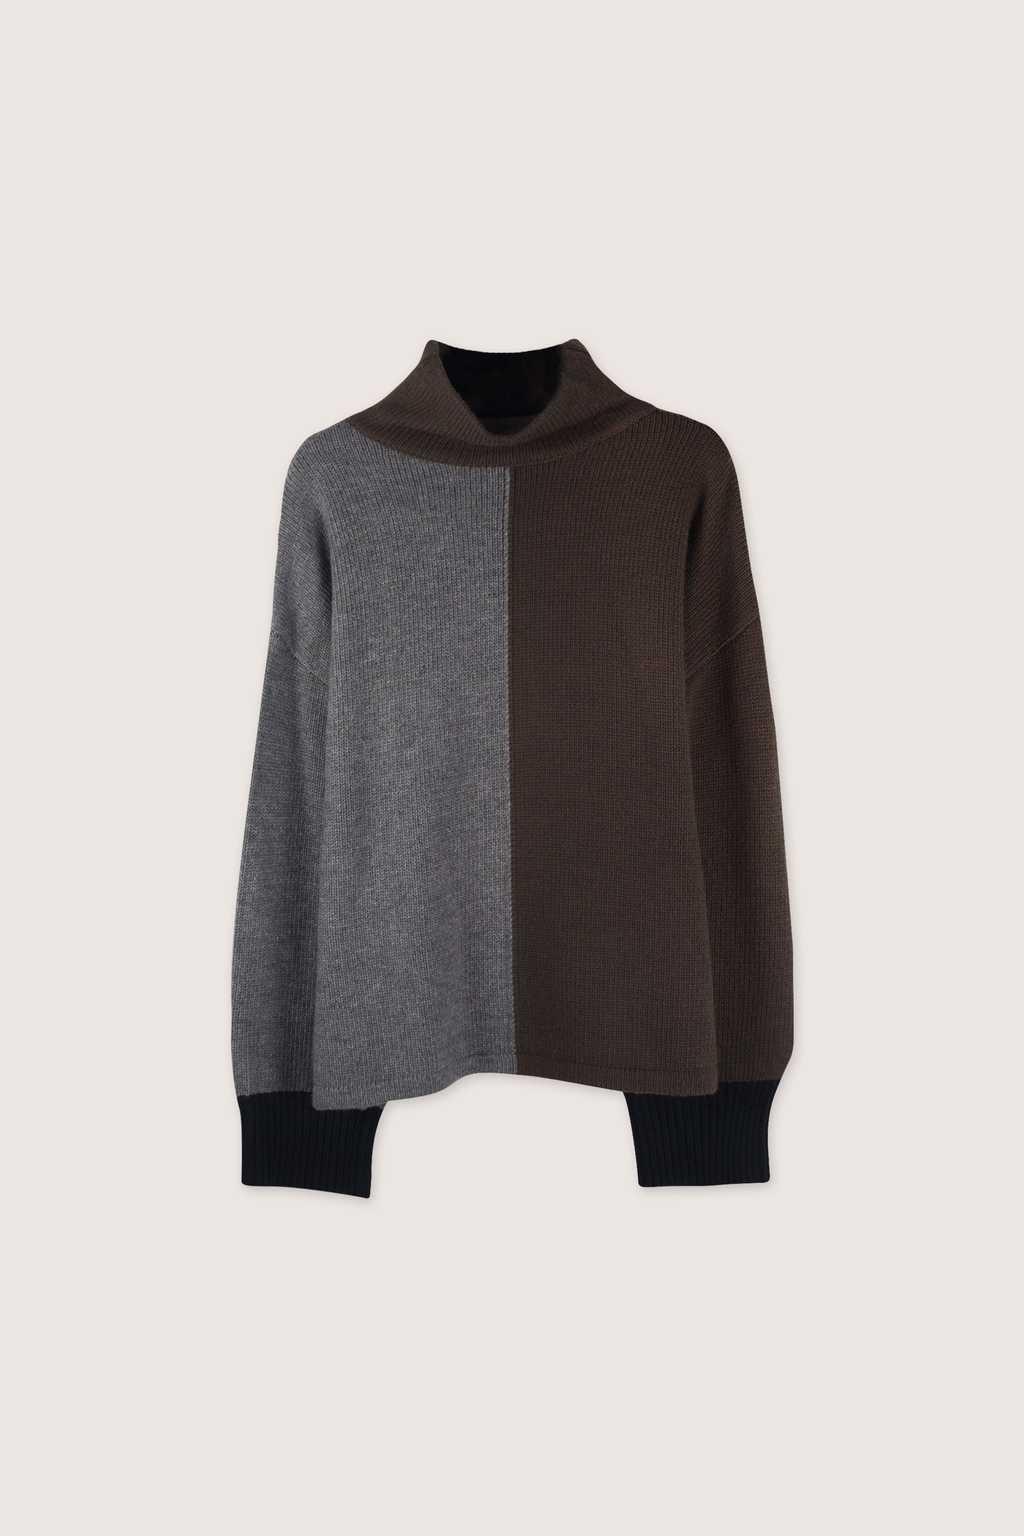 Sweater 1745 Olive 7